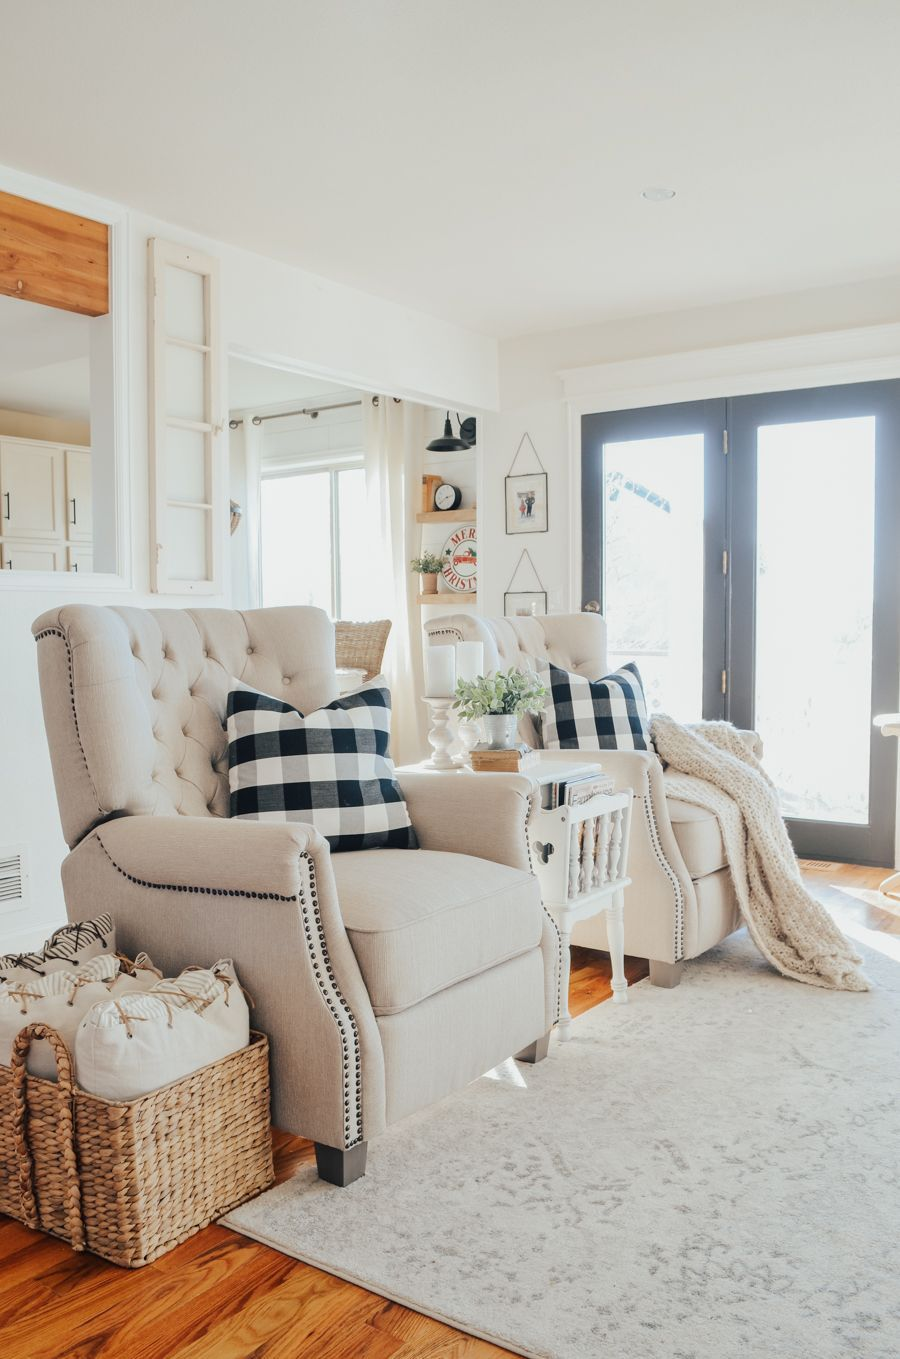 30+ Inspirational Modern Living Room Decor Ideas #cozyliving